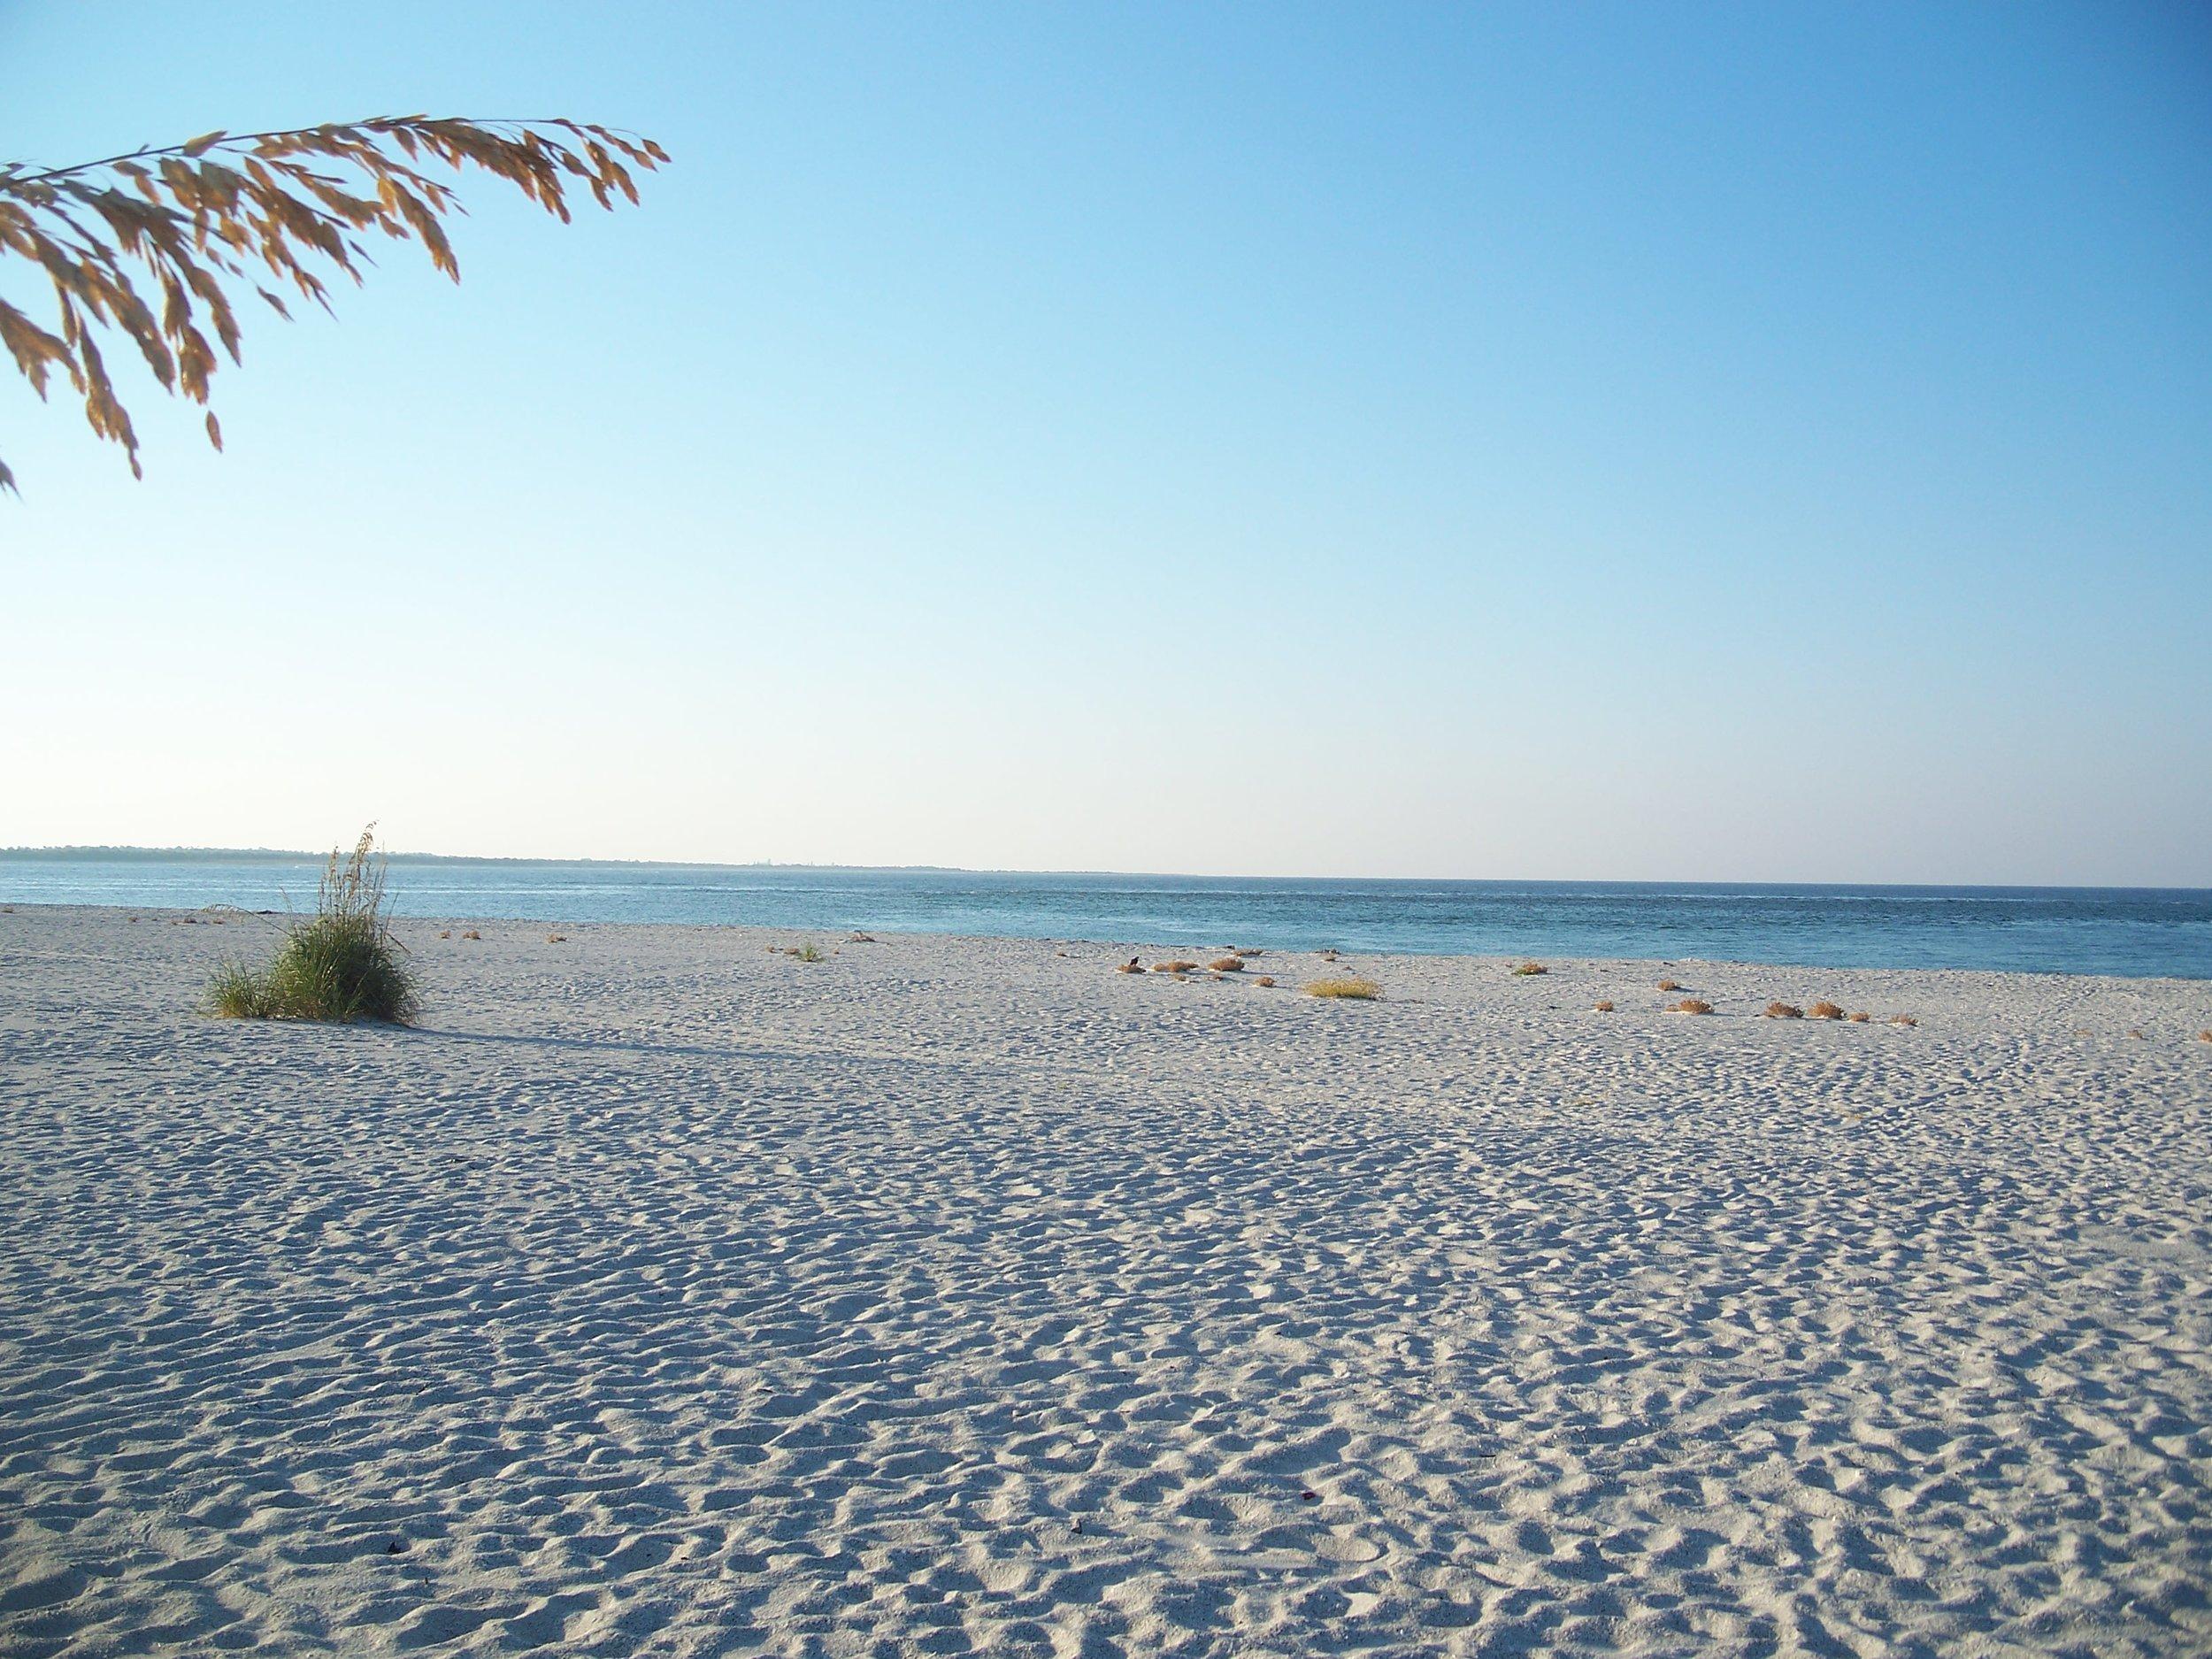 Gasparilla_Island_SP_beach05.jpg